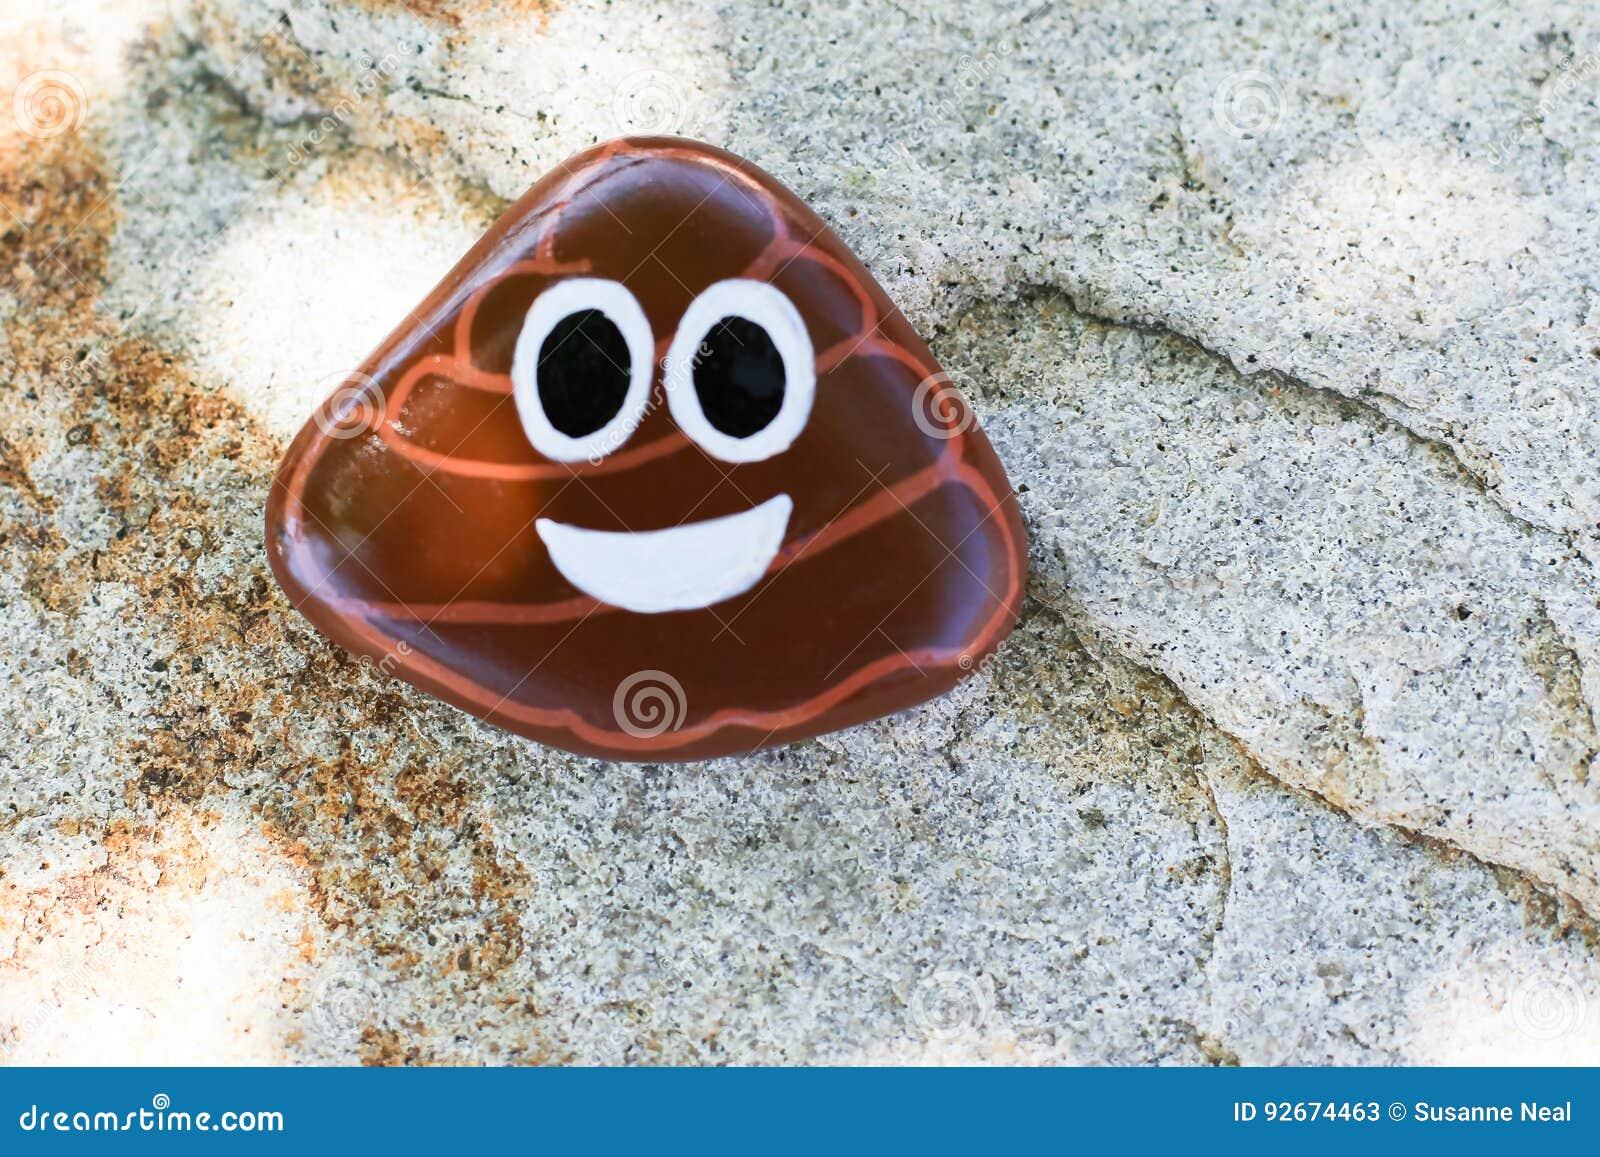 Painted Rock Of Poo Emoji Stock Photo - Image: 92674463